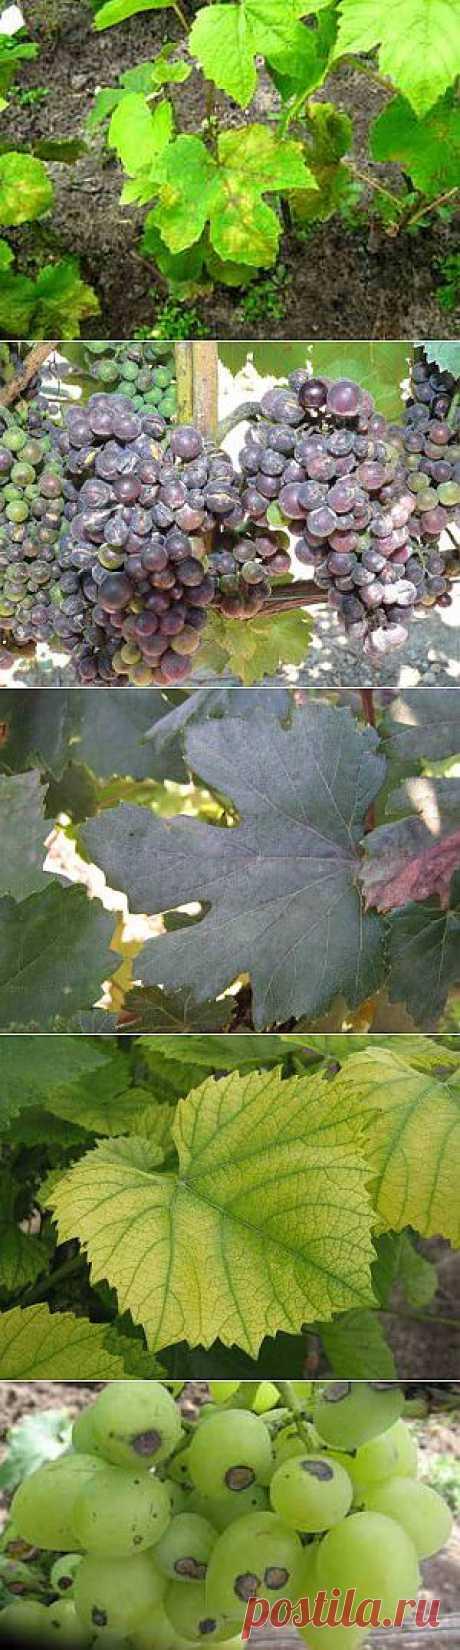 Борьба с болезнями винограда картинки | Дача - впрок